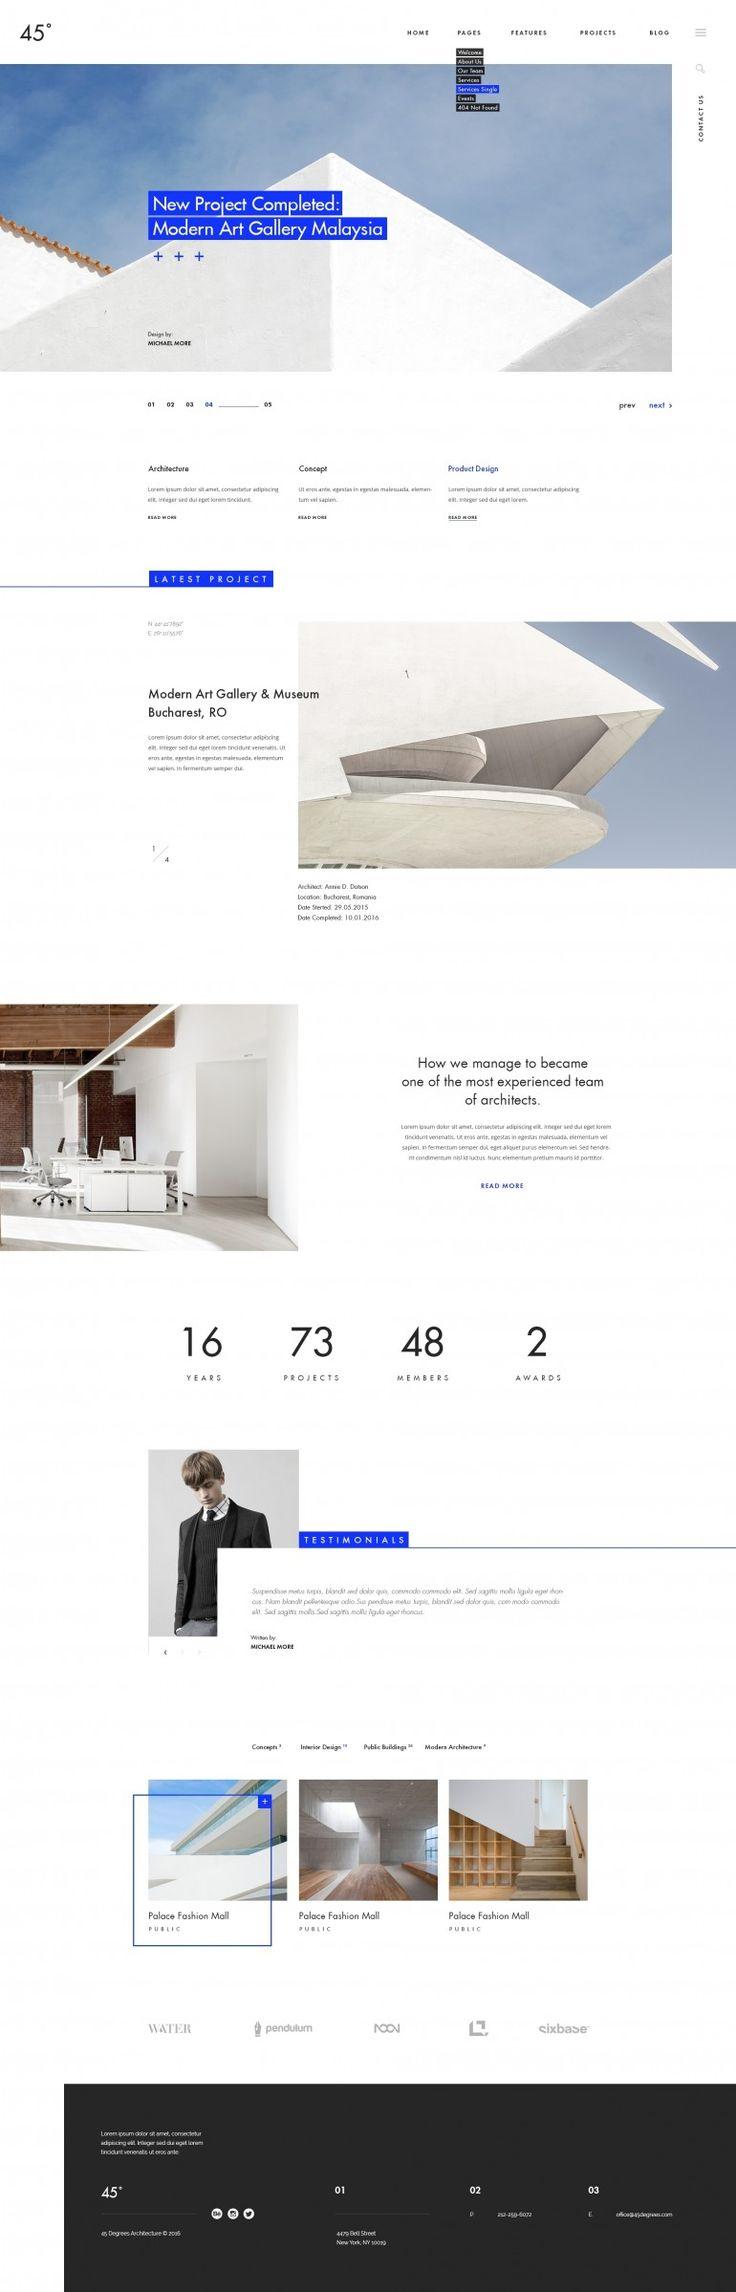 45 degrees – Architecture Studio